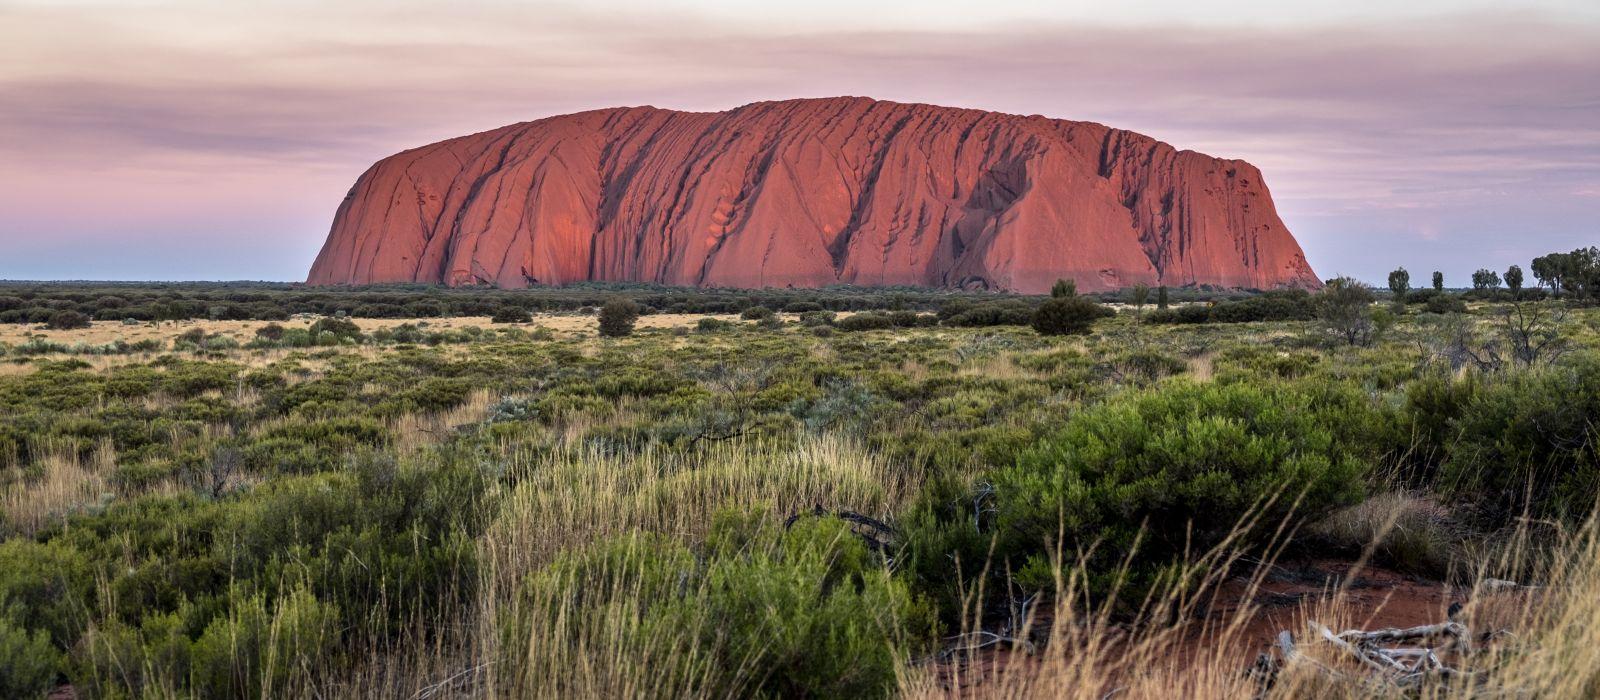 Destination Ayers Rock/ Uluru Australia